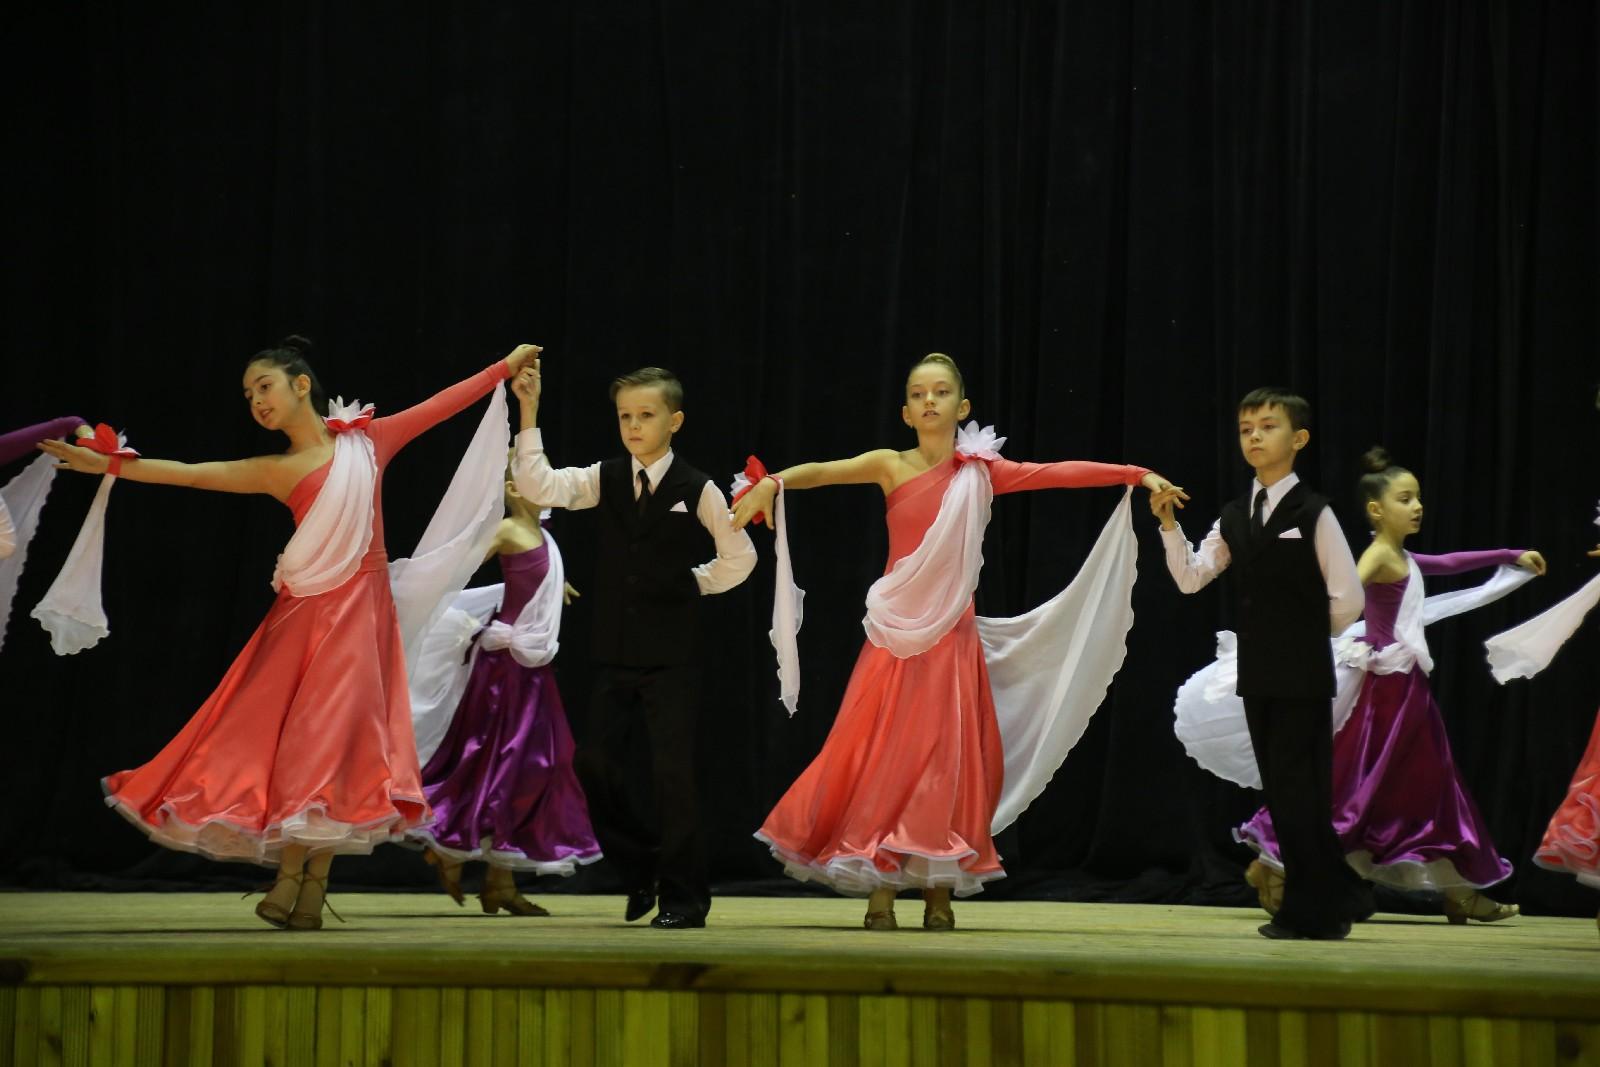 Ансамбль бального танца Торнадо